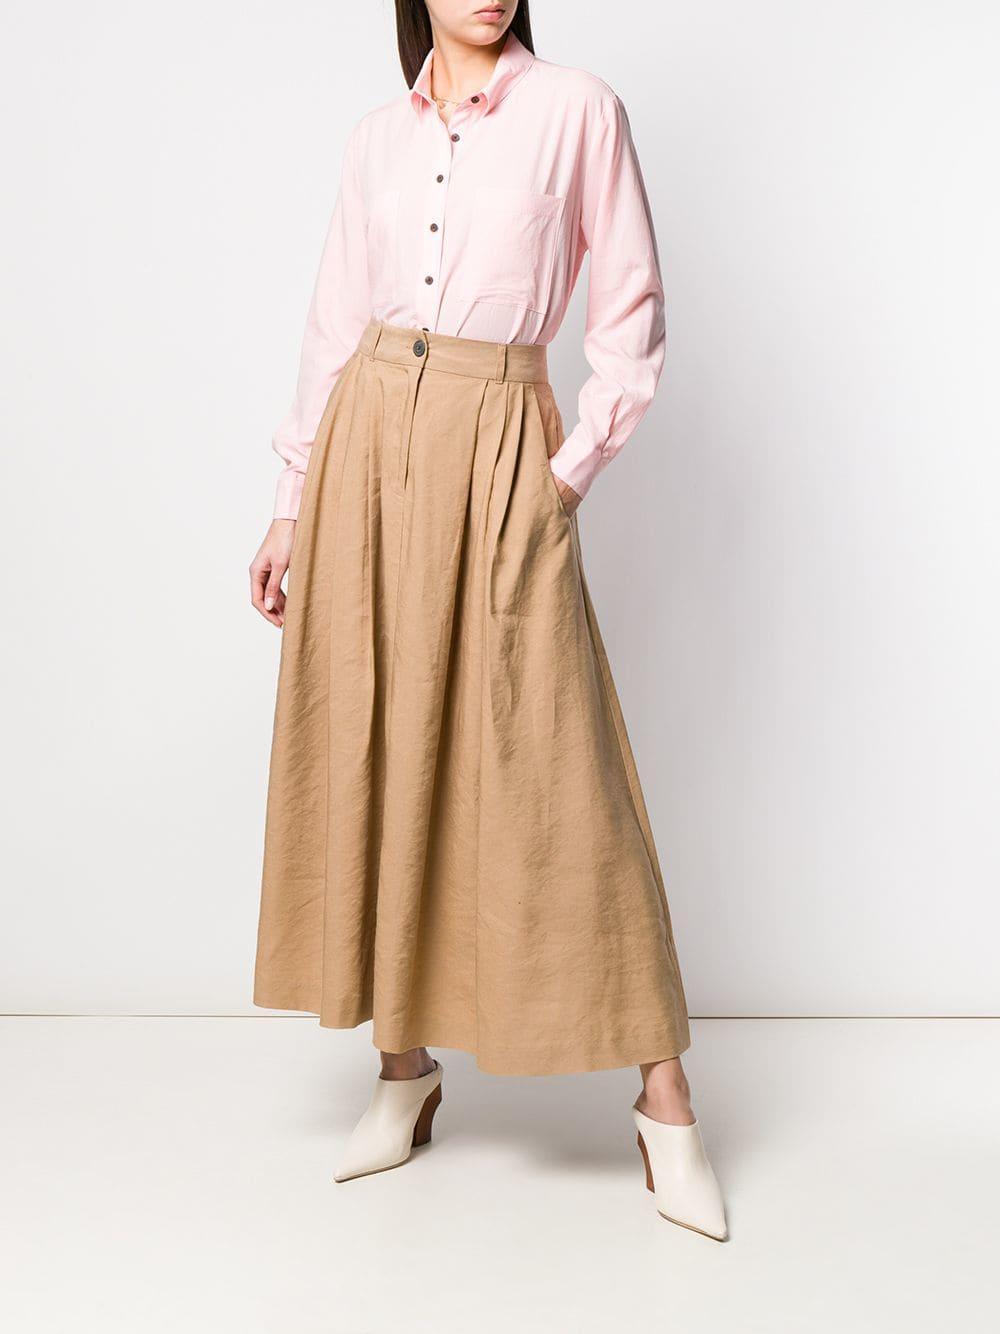 022980c4844 Lyst - Mara Hoffman Tulay Skirt in Brown - Save 37%